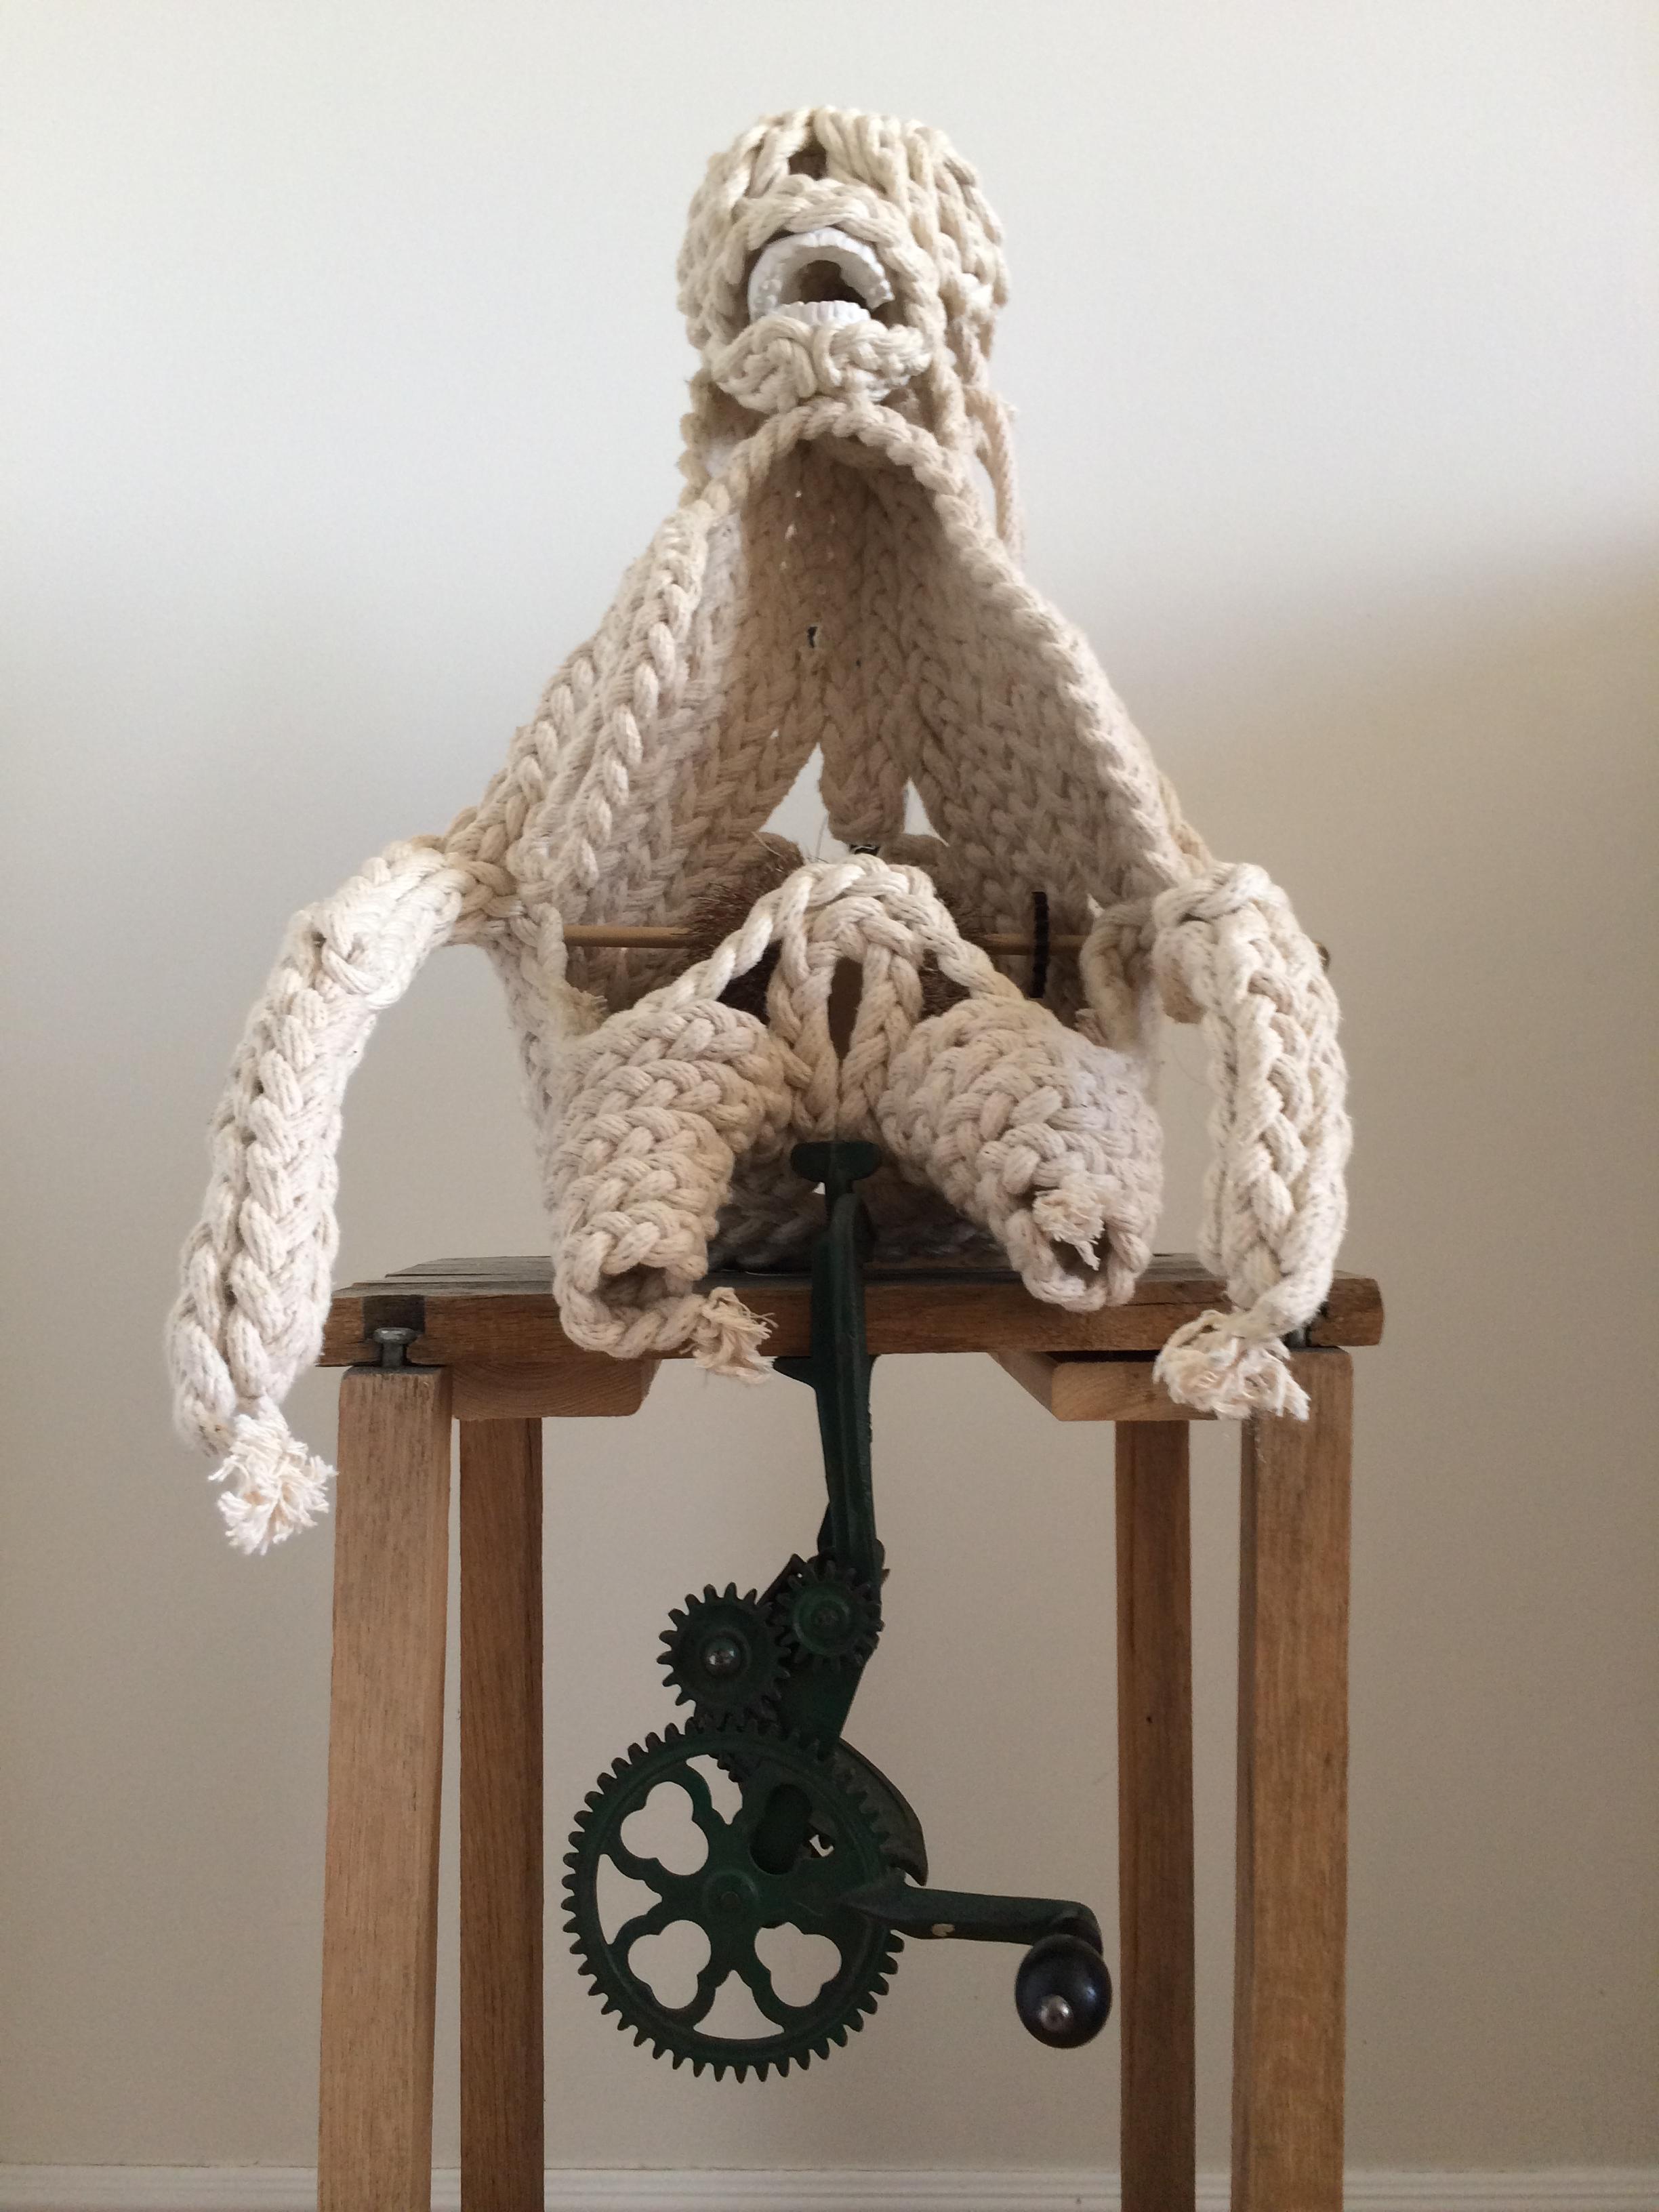 ROPE PORTRAIT Cotton rope, steel wire, ceramic, hair